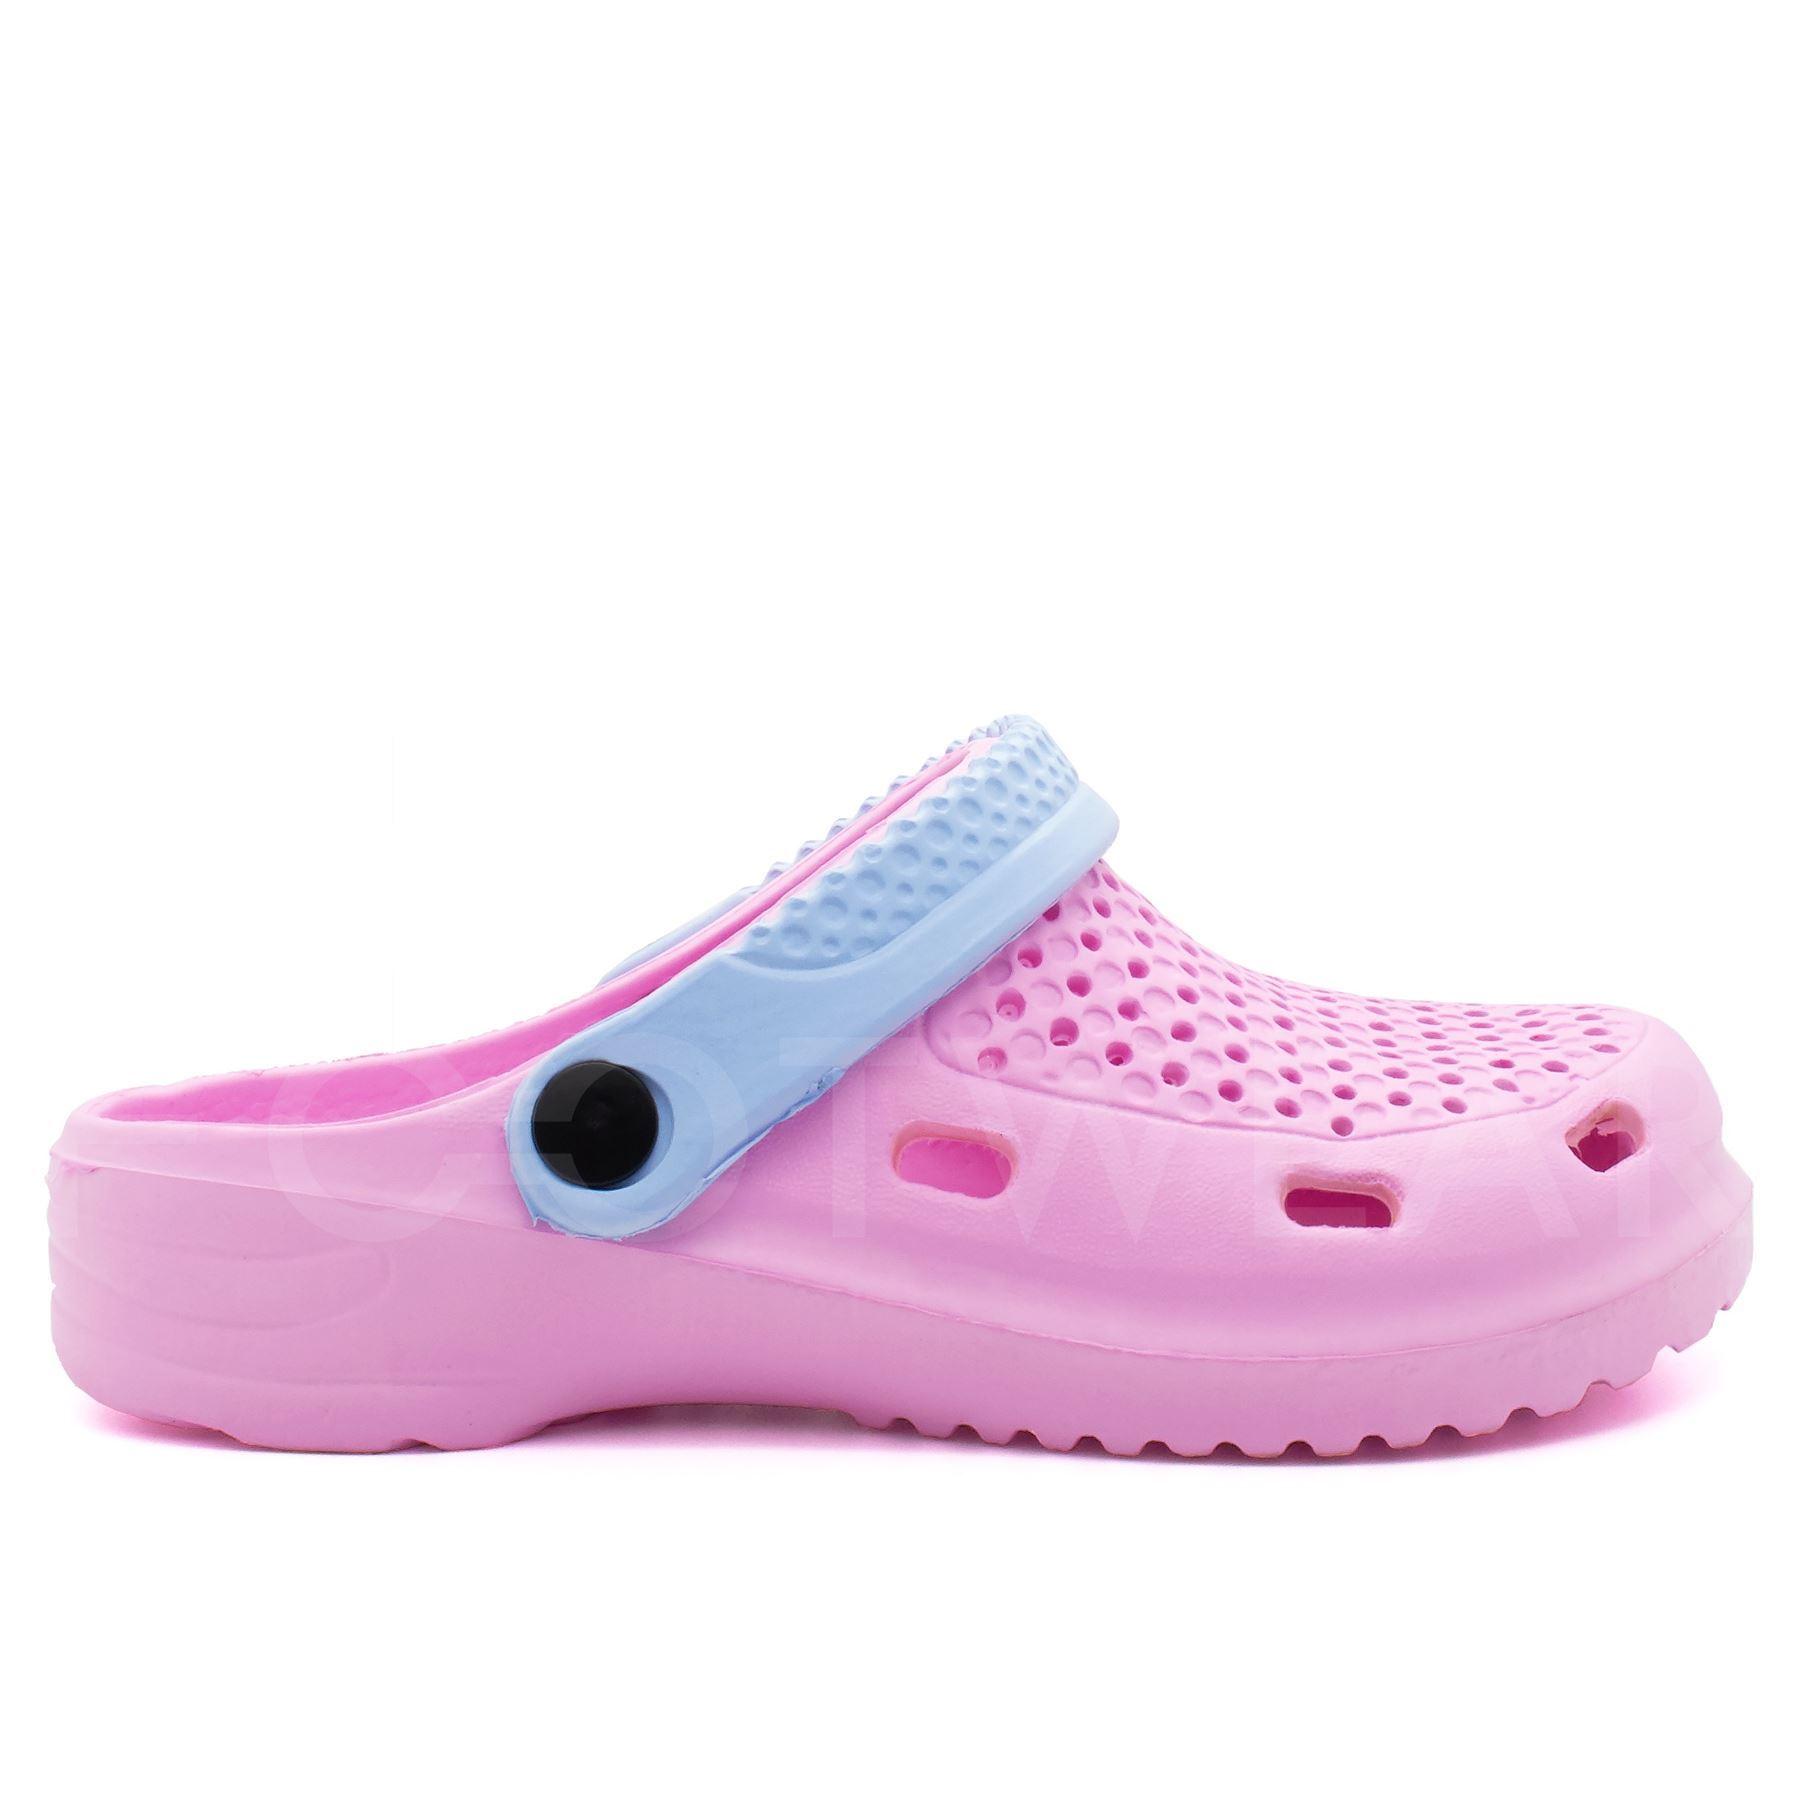 New Womens Clogs Garden Kitchen Hospital Sandals Shoes